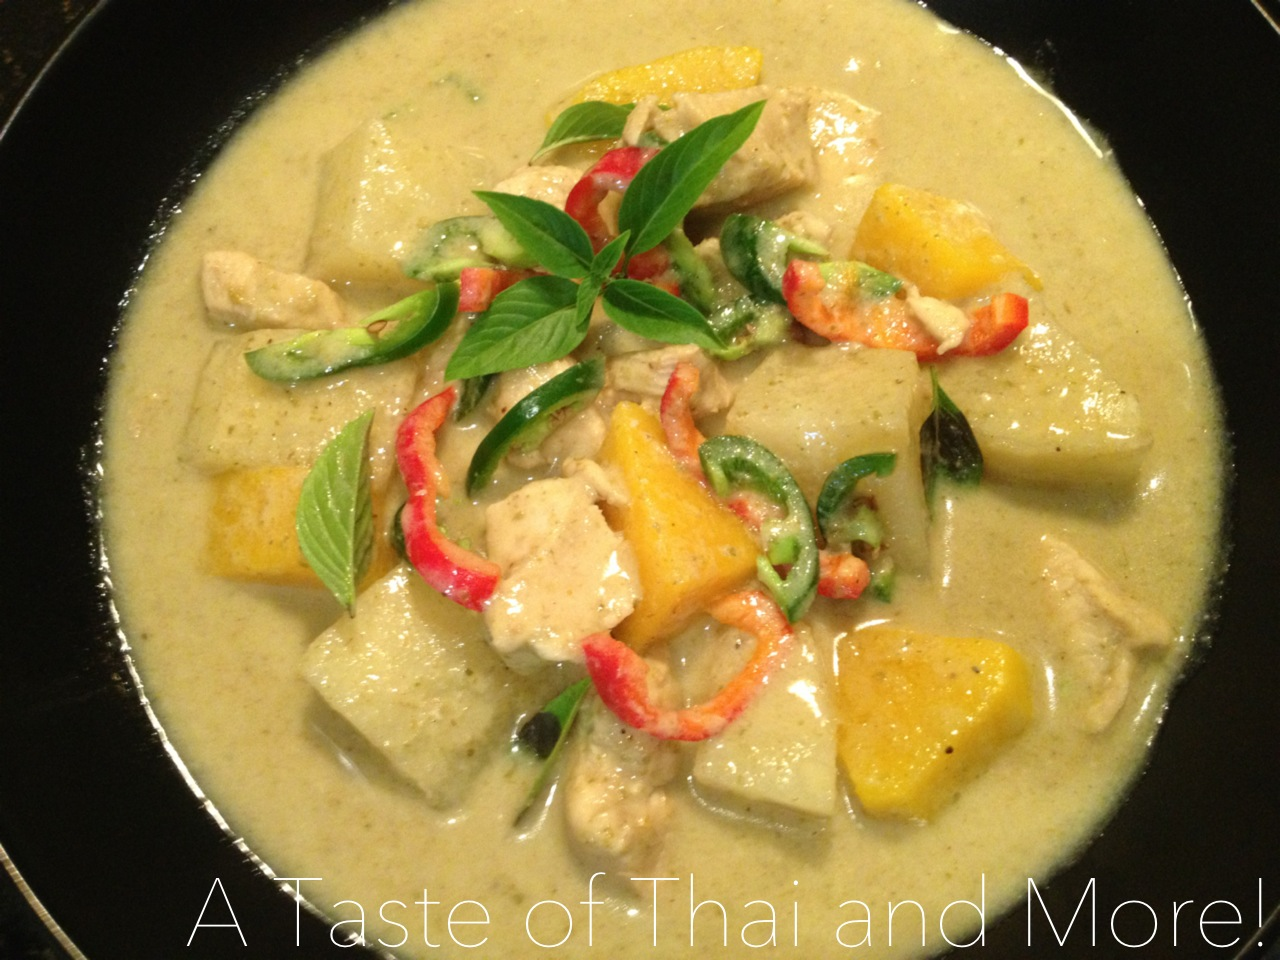 Thai Green Curry with Chicken (or vegetarian) – Gaeng Kiaw Wan Gai